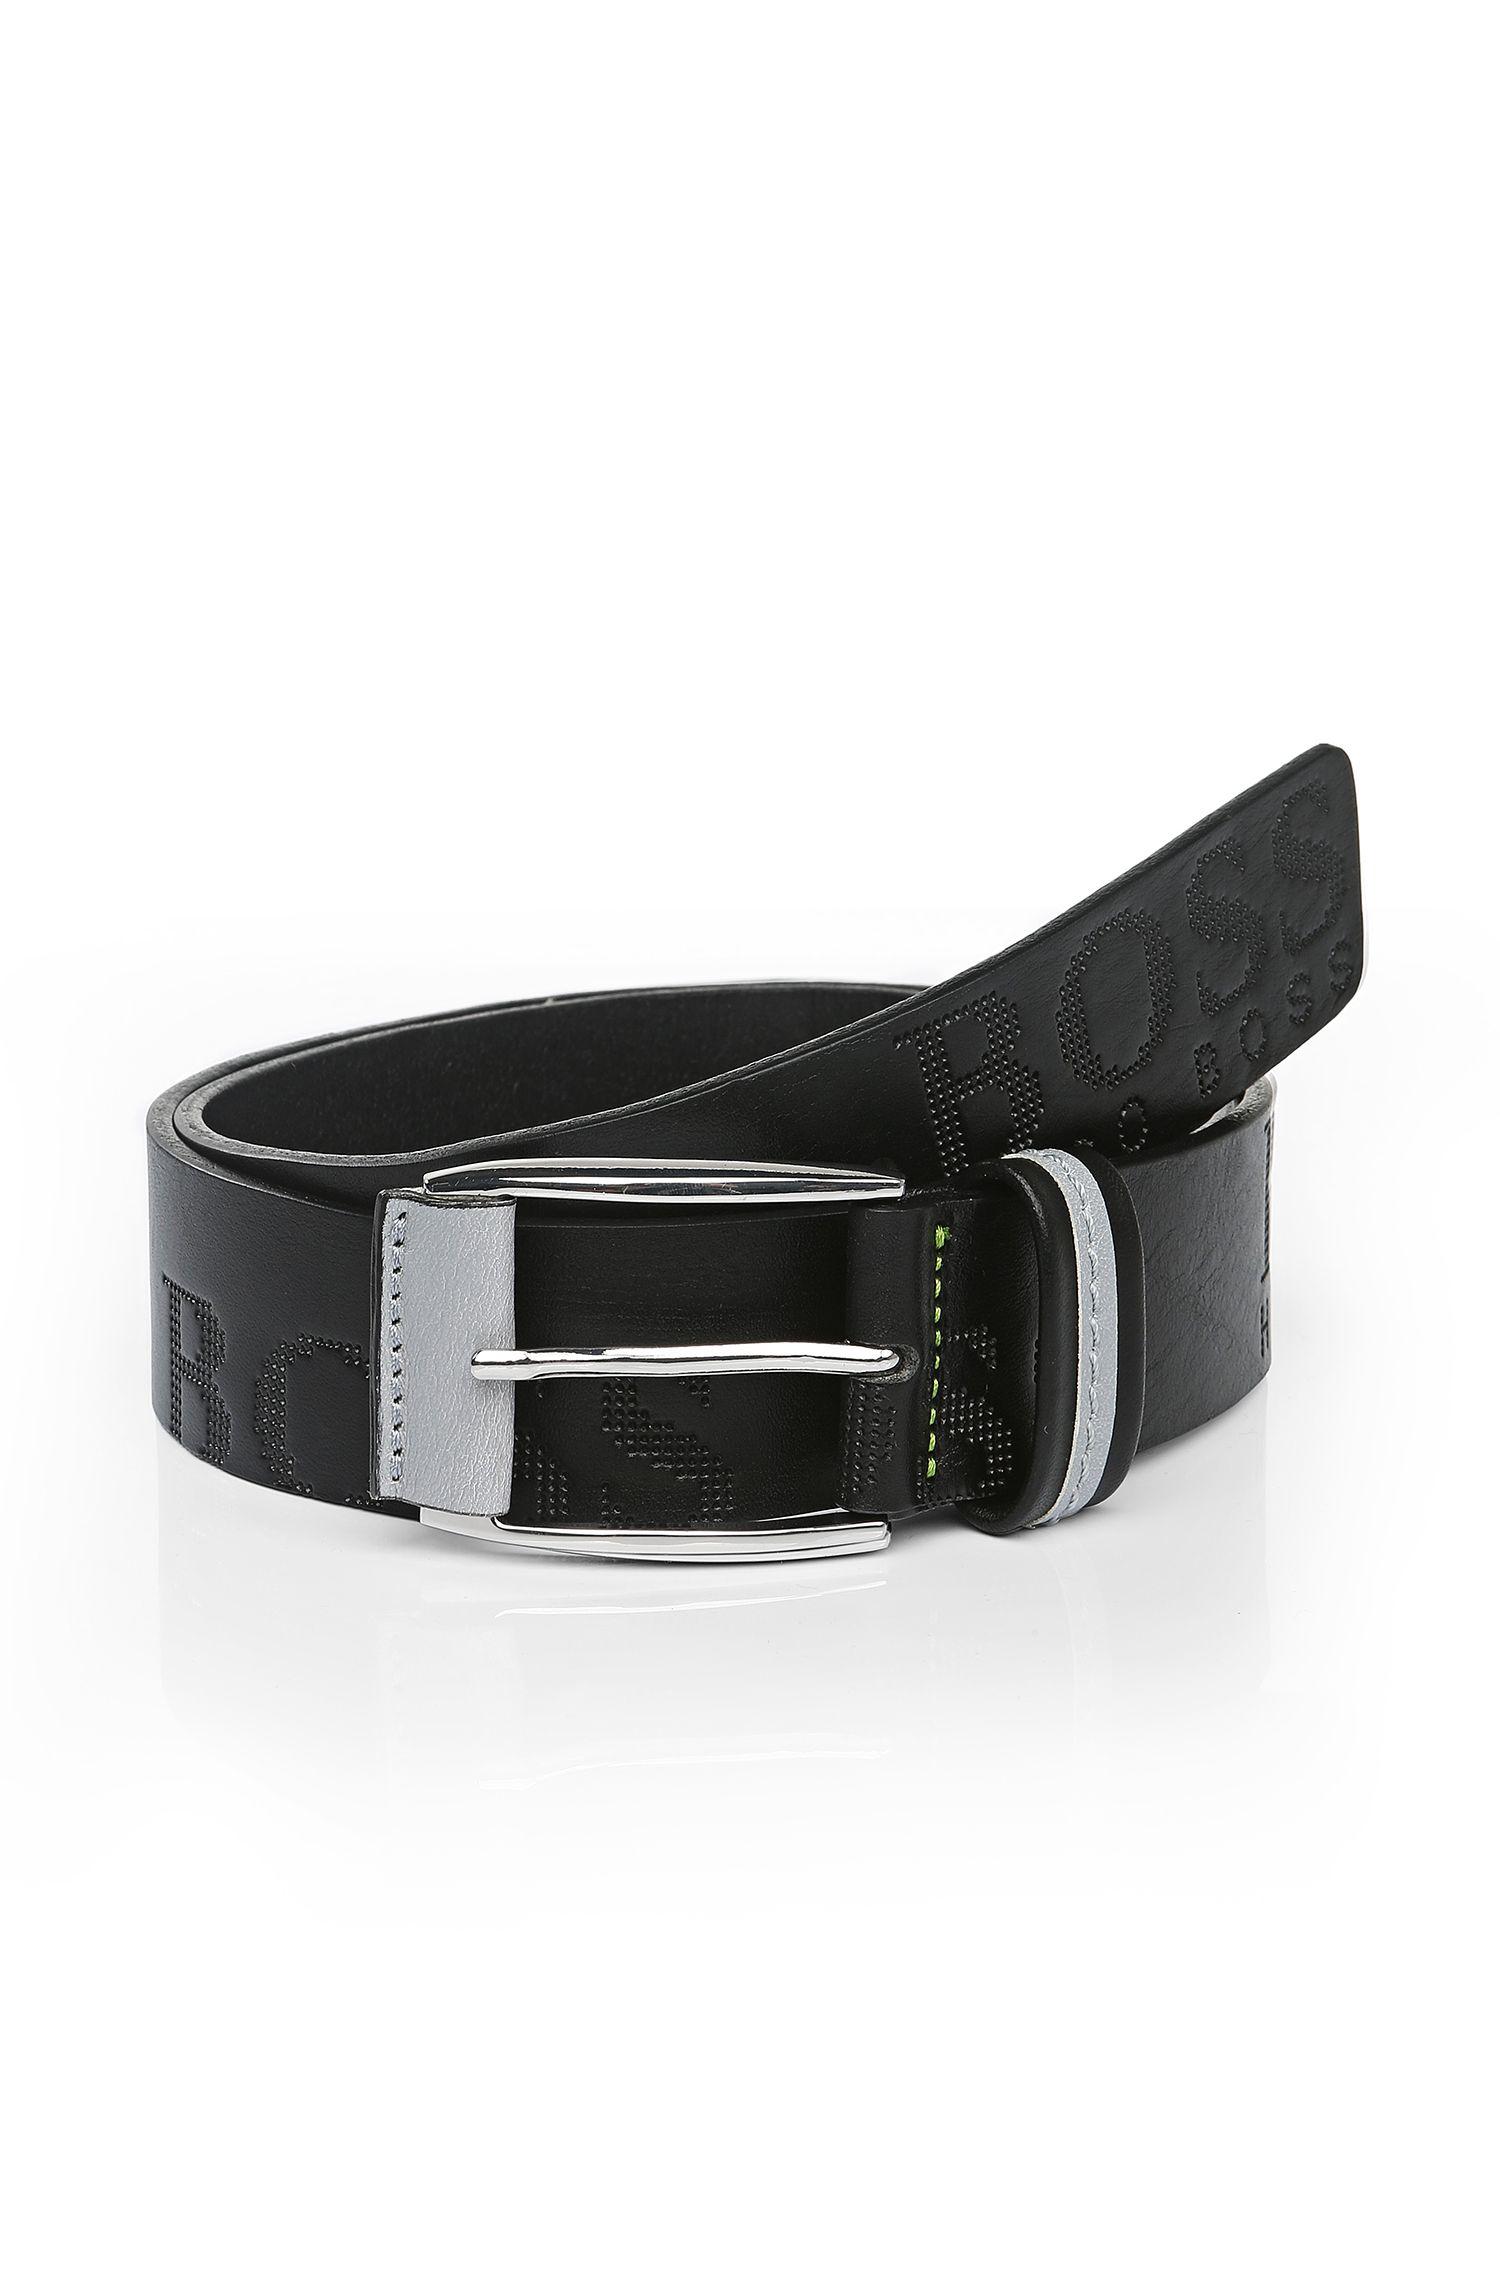 'Millow' | Italian Leather Embossed Logo Belt